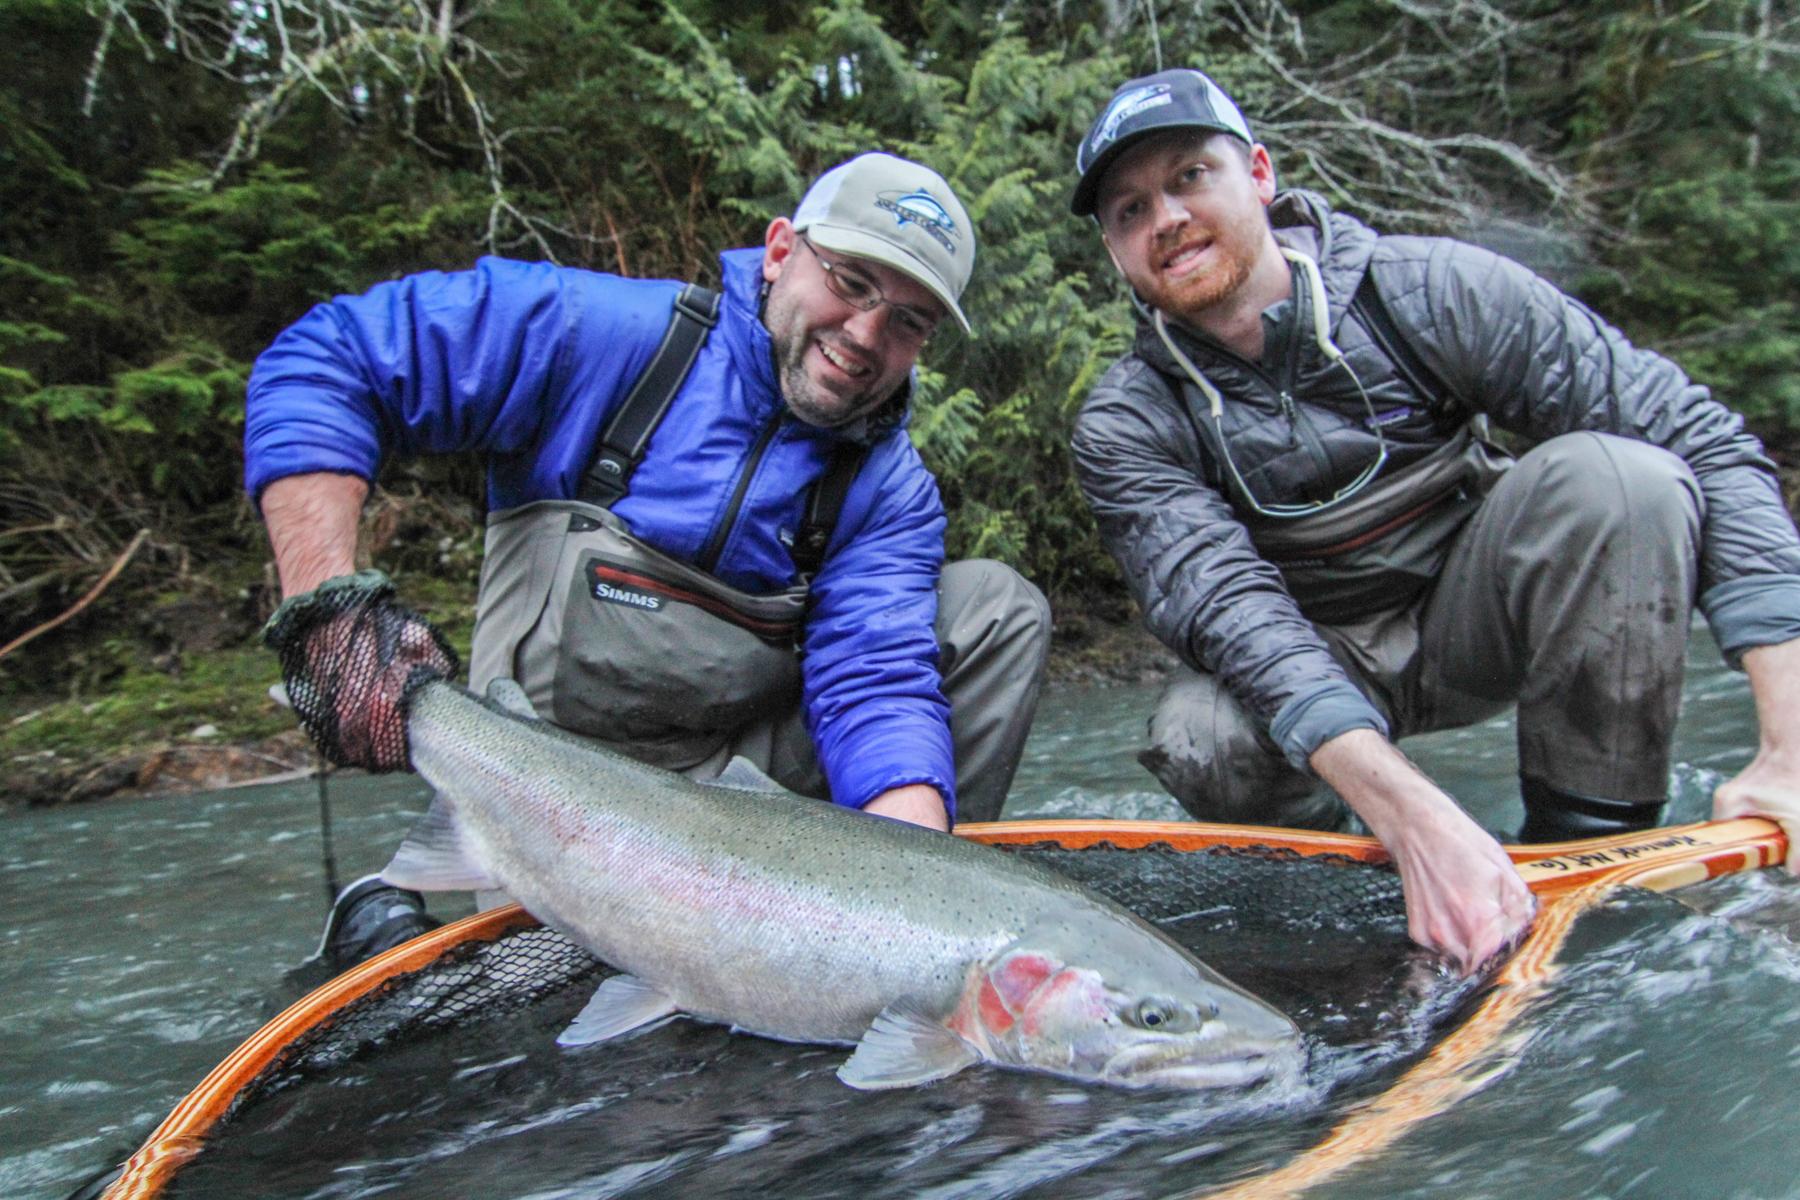 Washington Winter Steelhead Fly Fishing - Forks Washington - Olympic Peninsula Fly Fishing